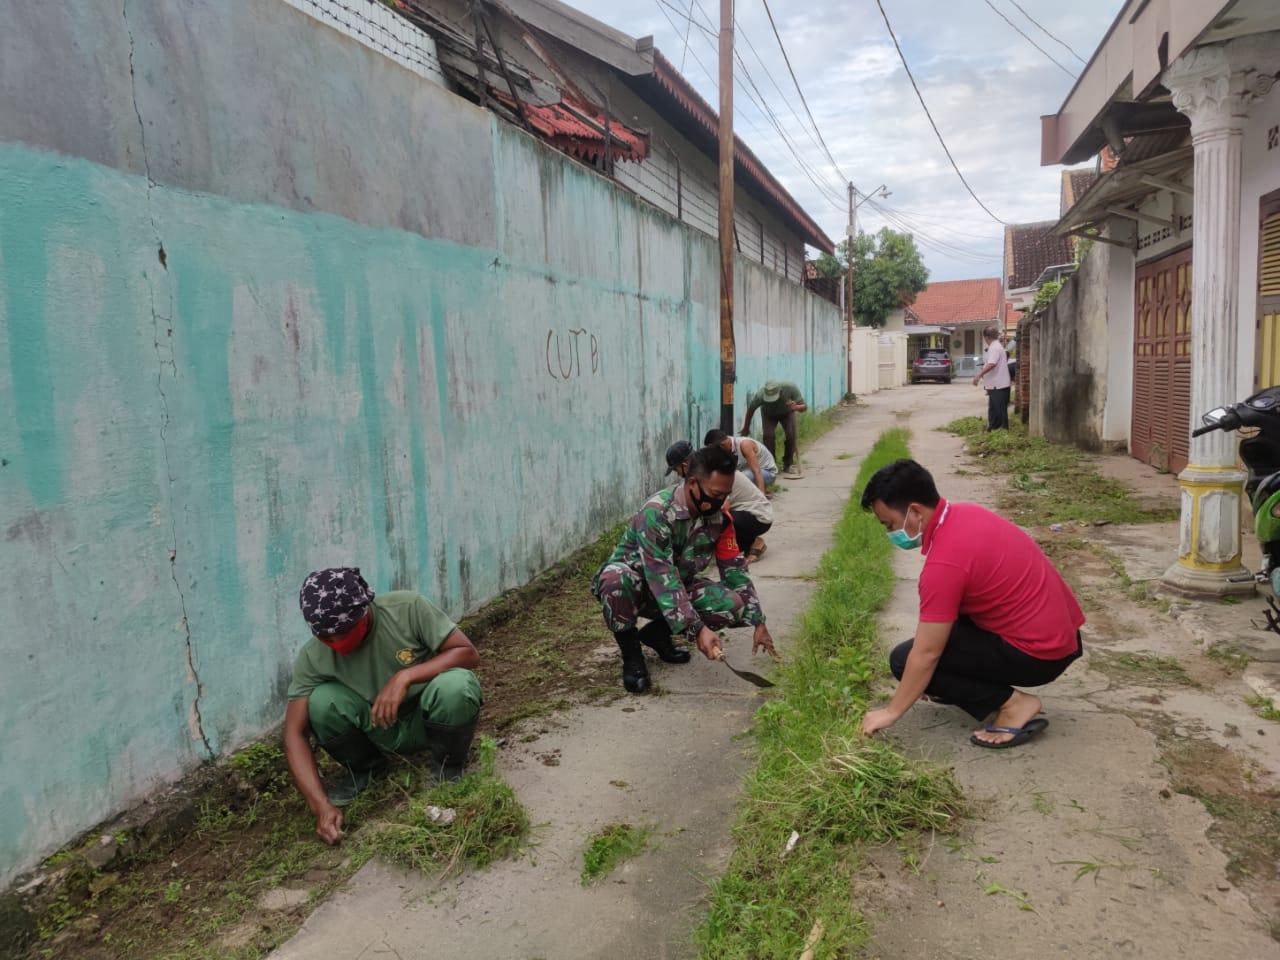 Babinsa Koramil 410-06/Kedaton Serka Sugeng melaksanakan kegiatan gotong-royong di wilayah binaanya di Jln. Teuku Umar, RT 04 LK. I, Penengahan,  Kedaton